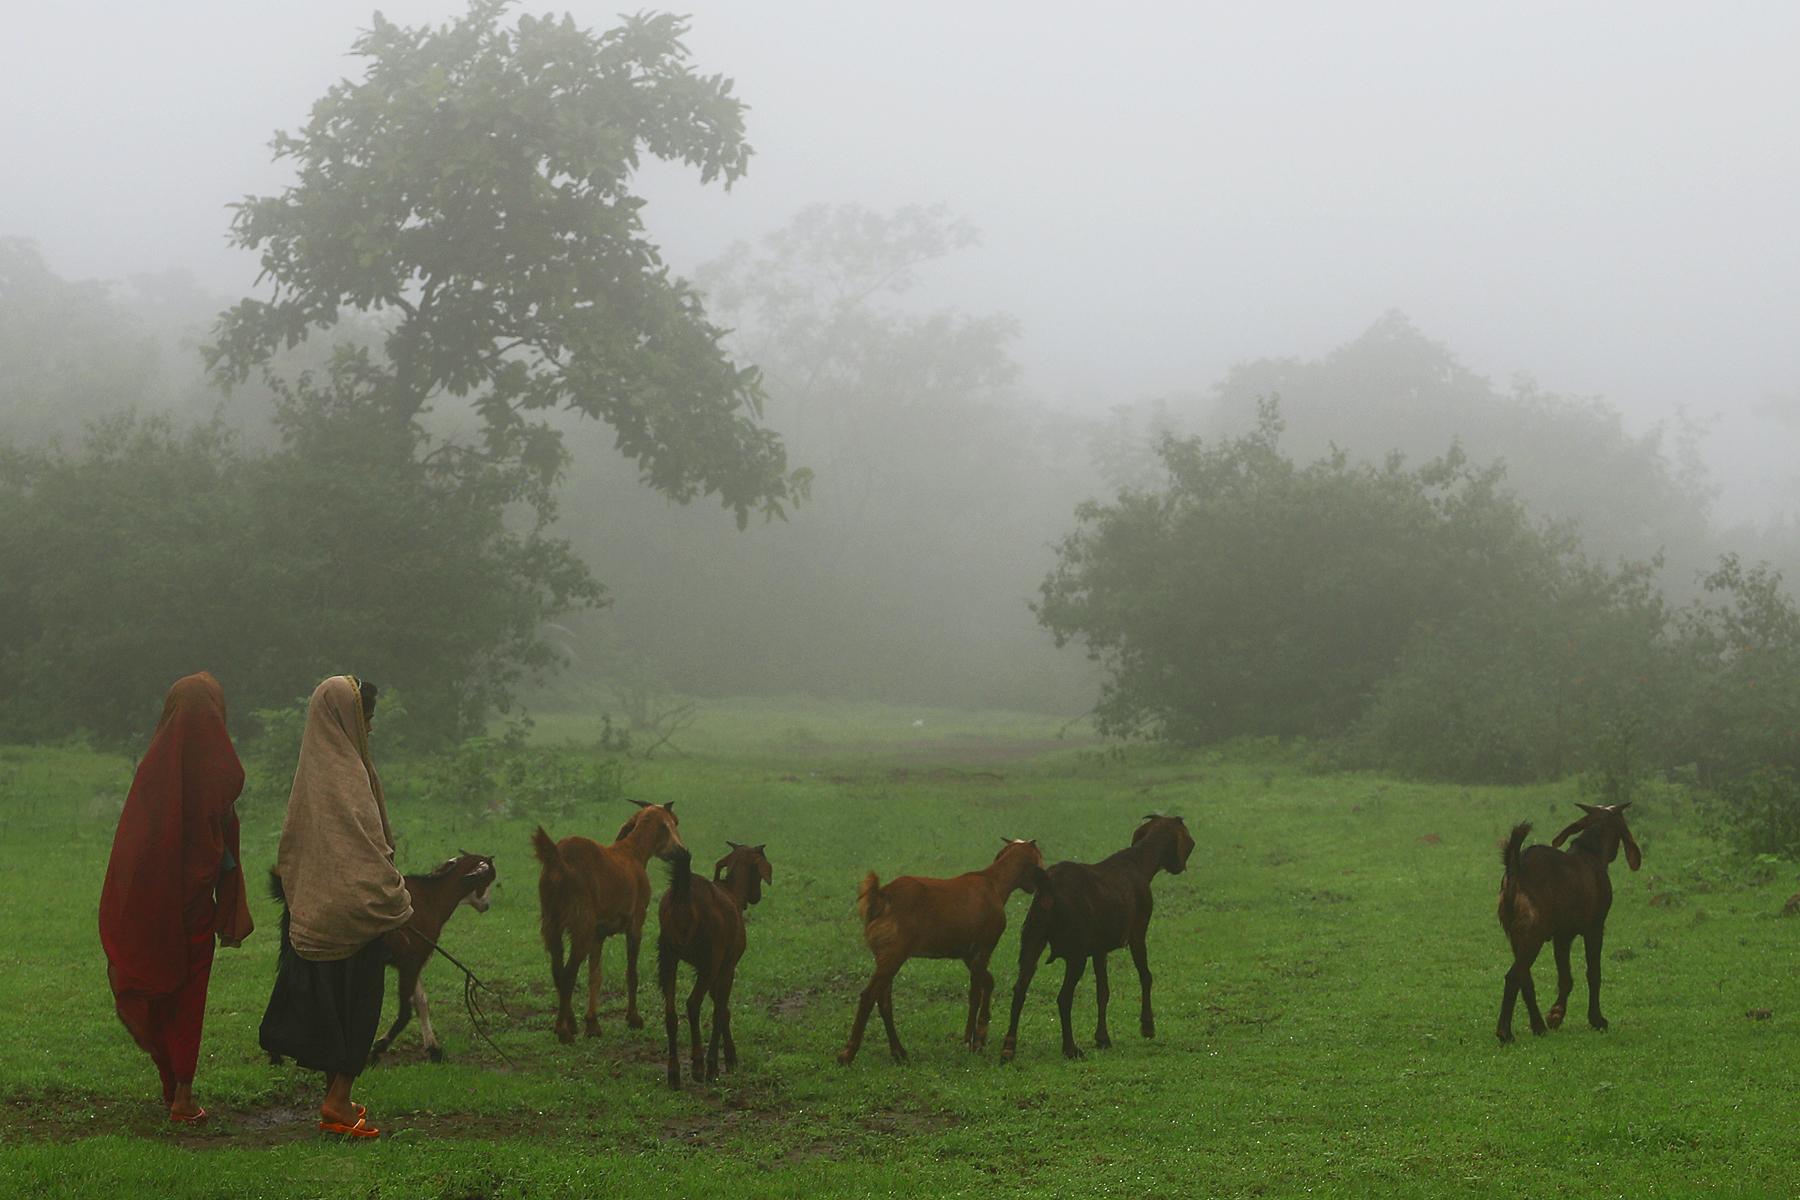 Monsoon misty atmosphere has rejuvenate charm. Human - urban or rural, animals get refresh by it .